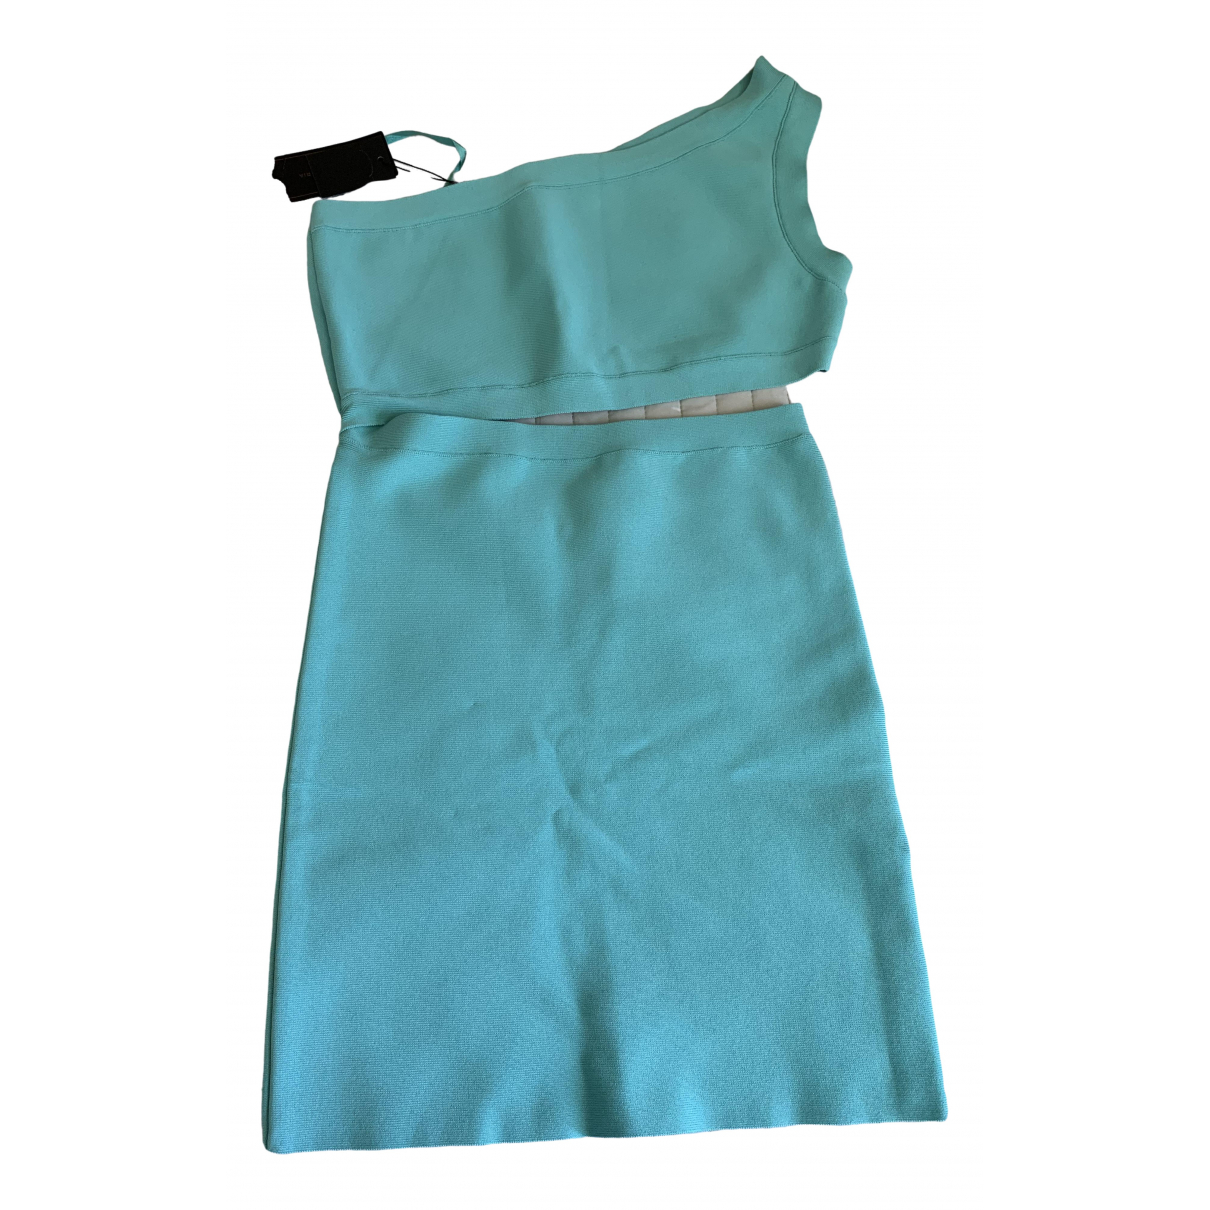 Bcbg Max Azria \N Turquoise dress for Women 38 FR